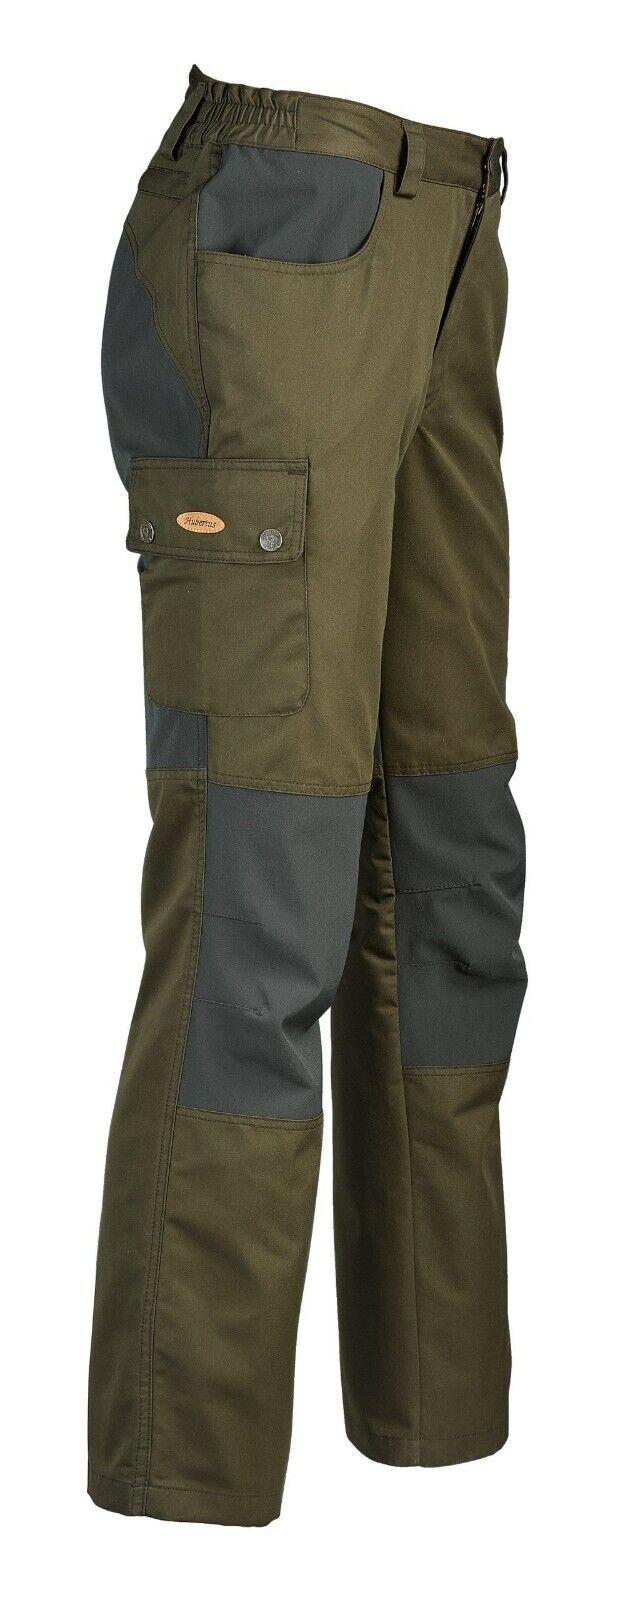 Hubertus caza pantalones  hidro Stretch  nuevo